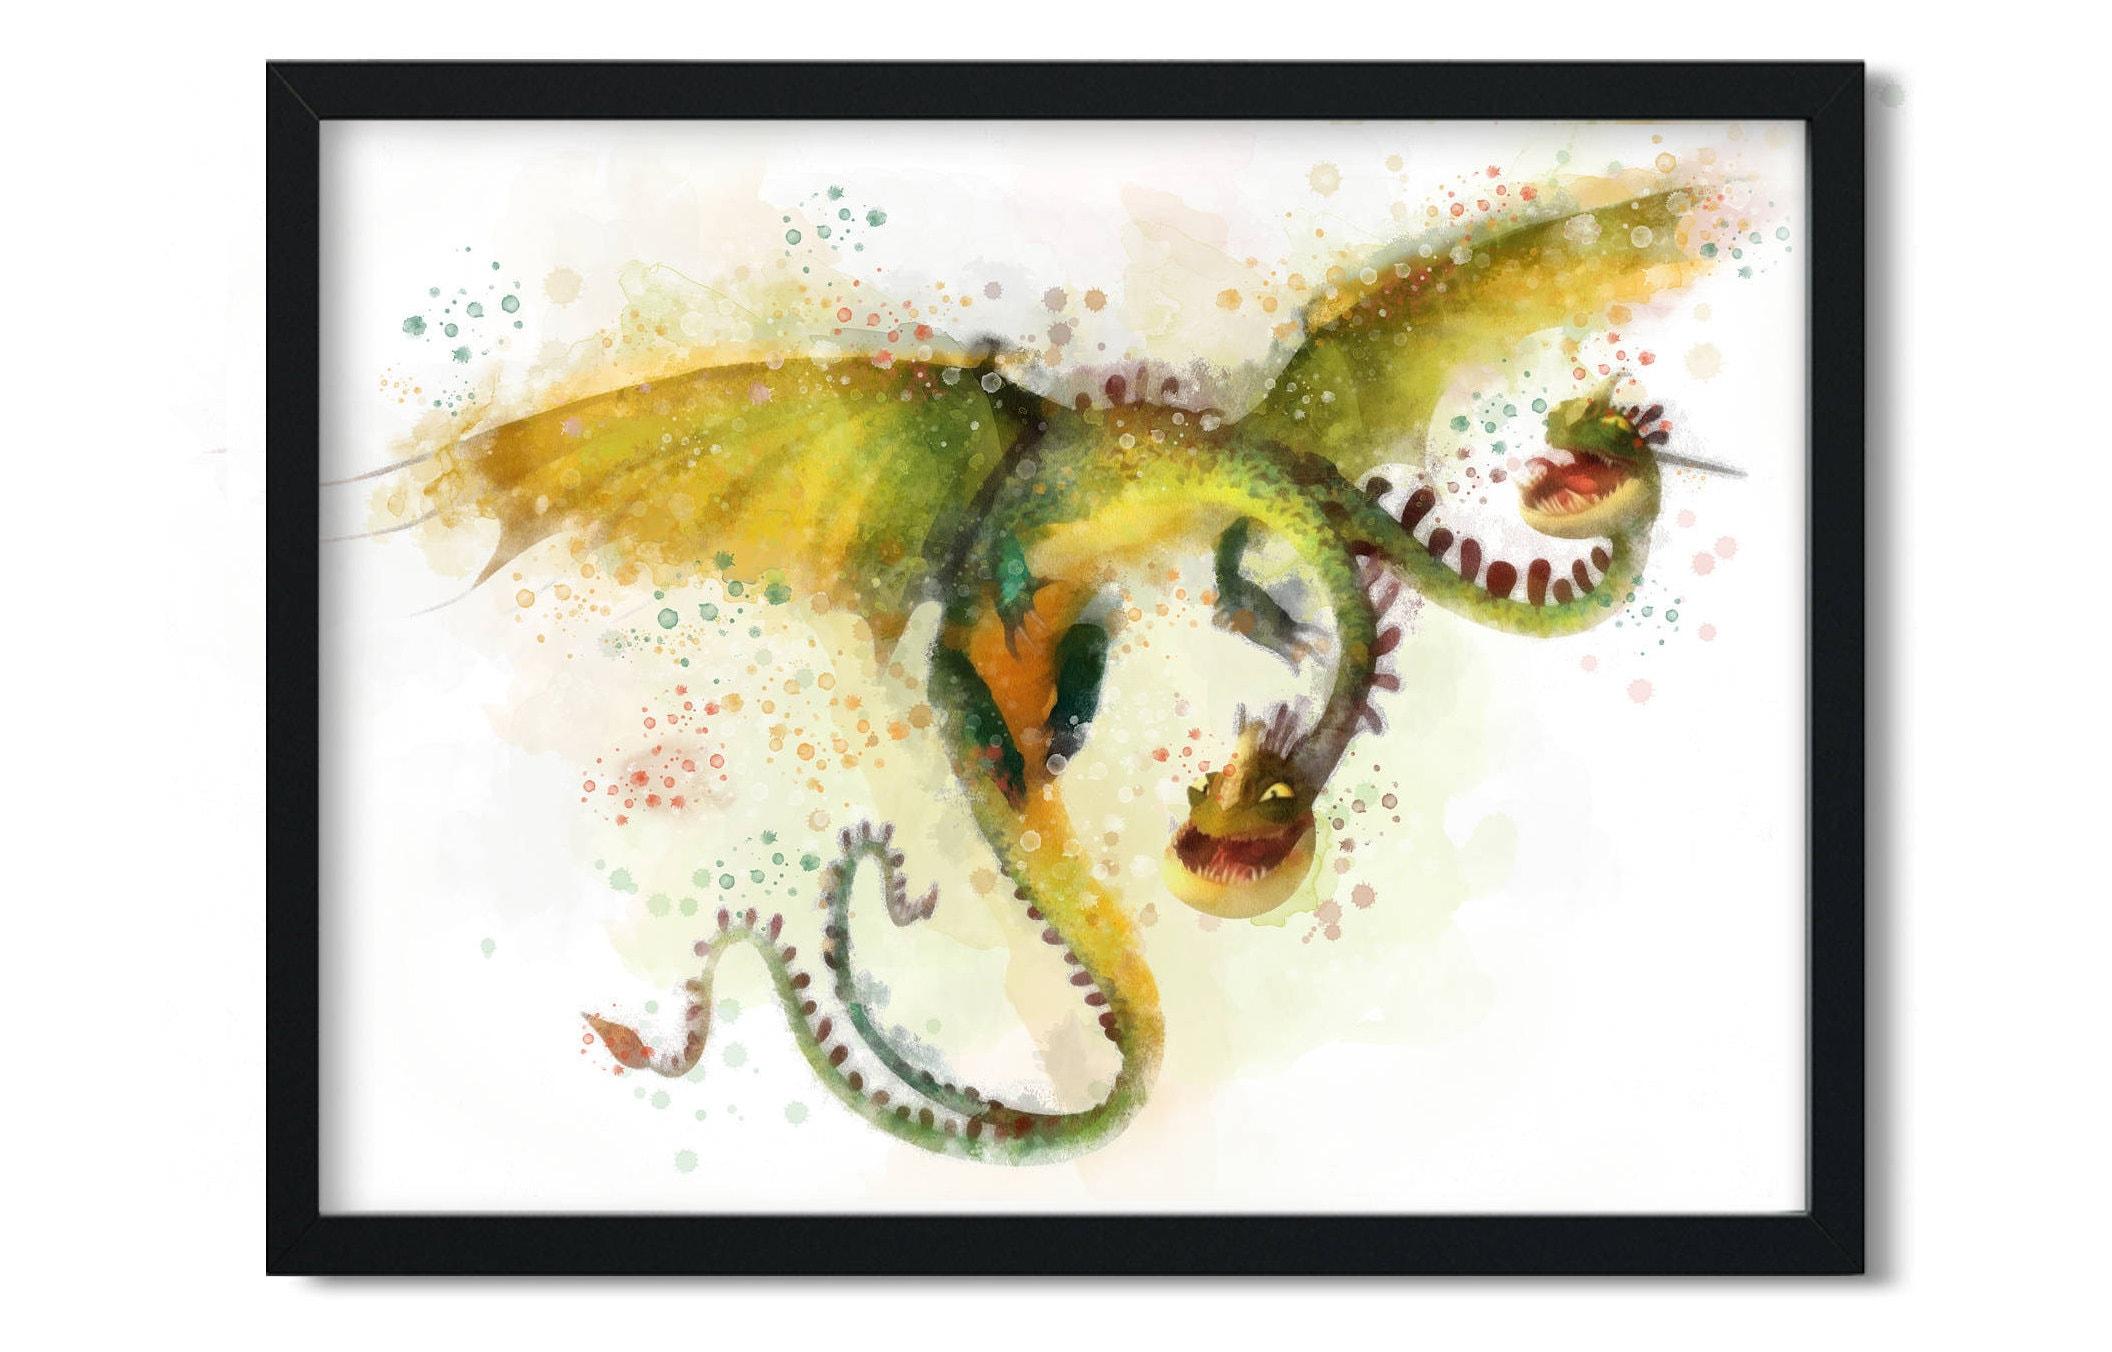 Dragons Riders of Berk Printable Dragons Riders of Berk Art